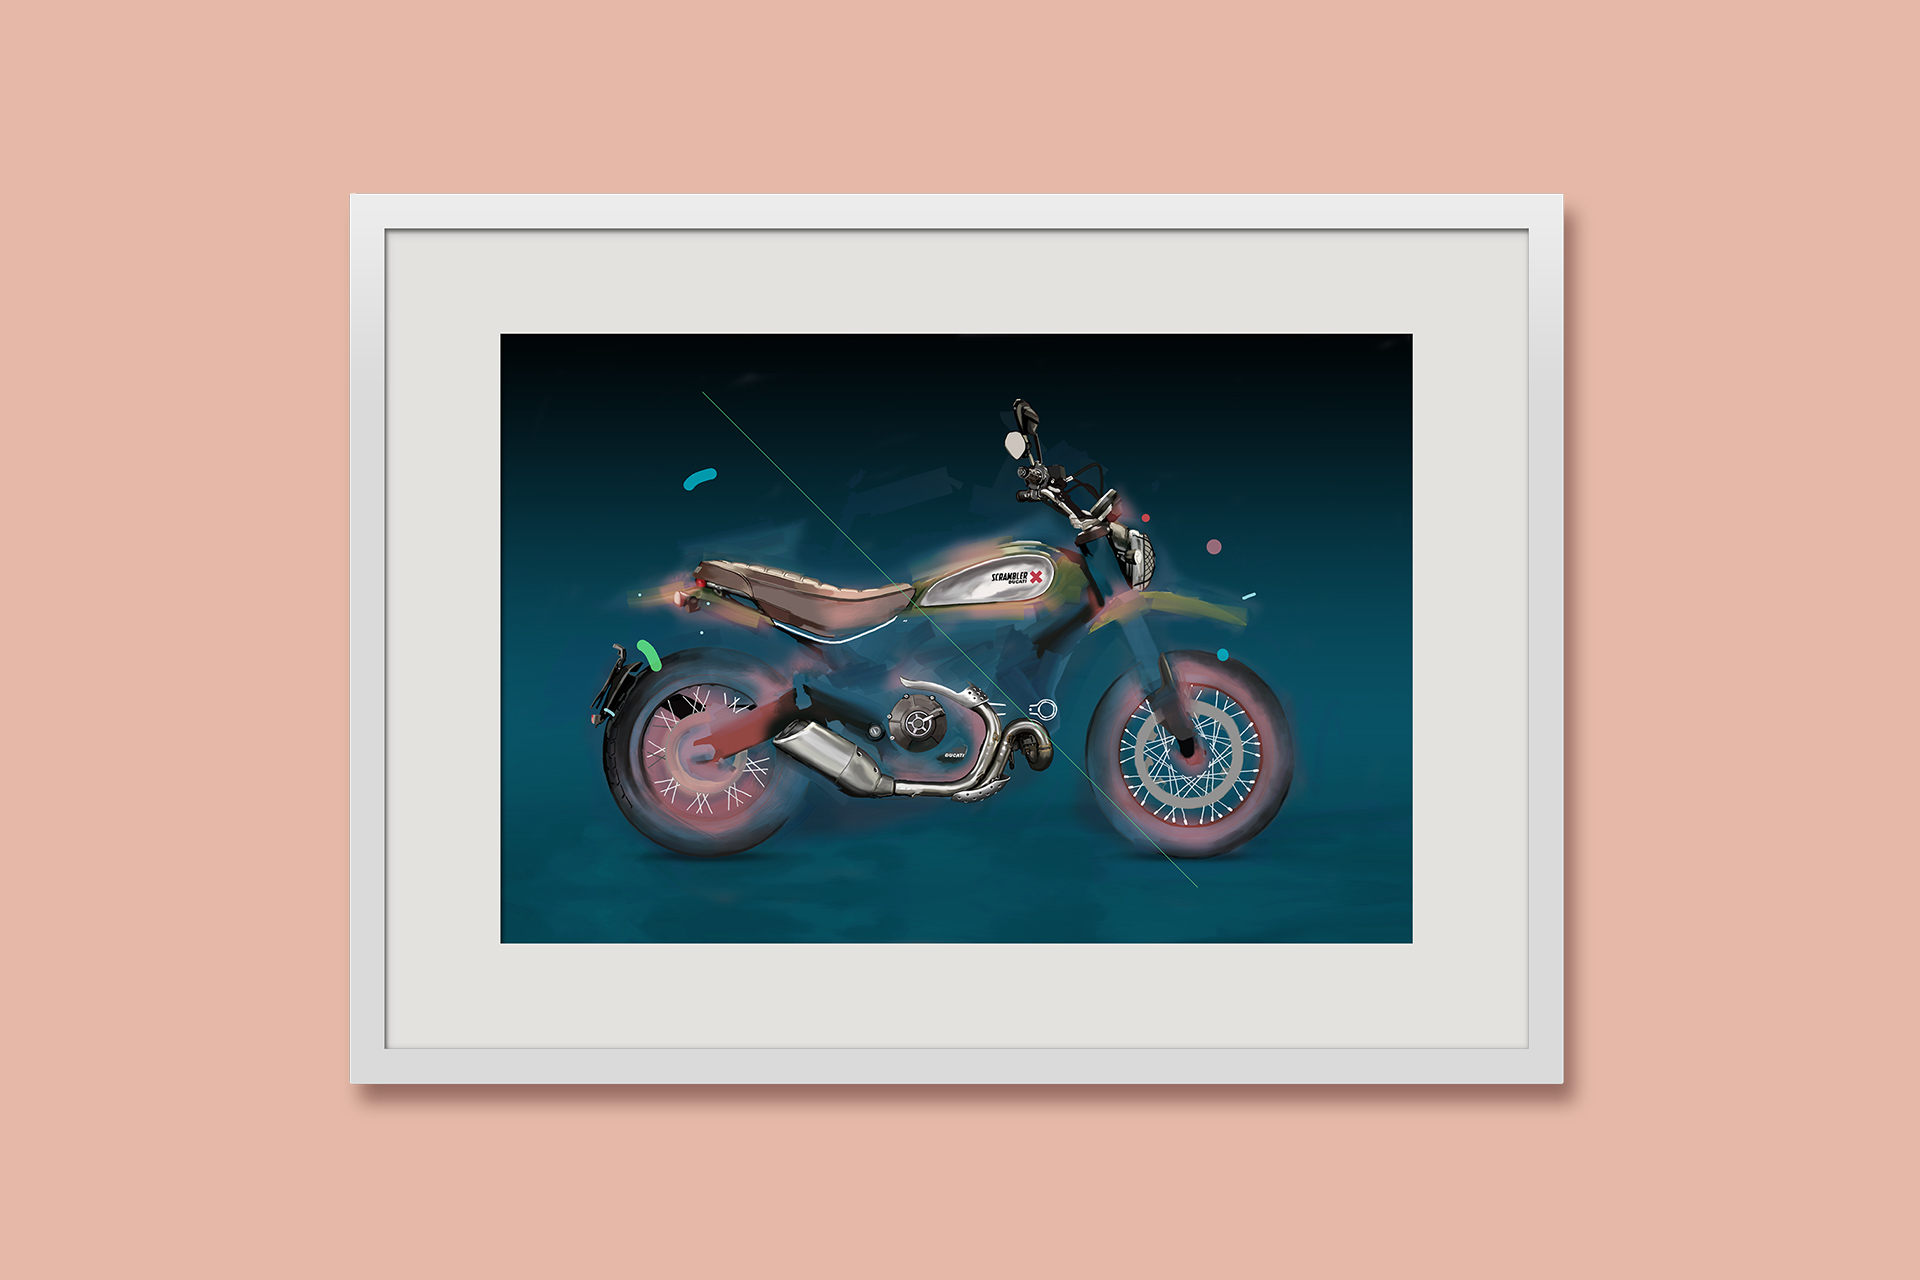 Ducati_Content_02_rosa_2